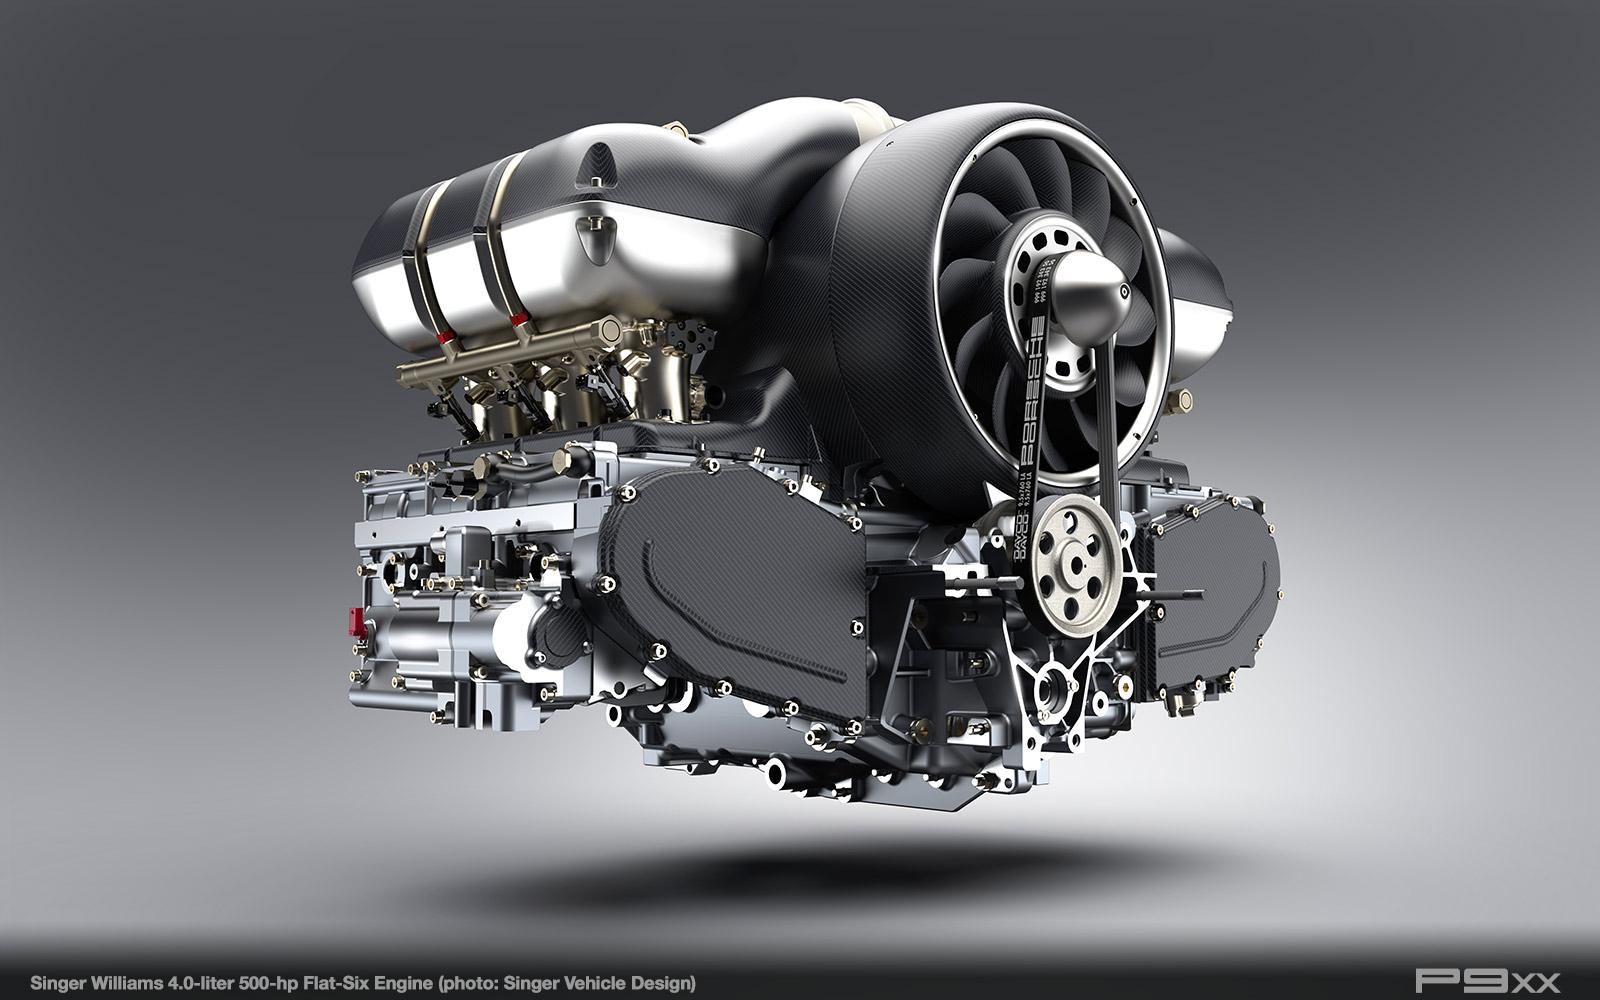 Singer Williams 4.0-liter Flat Six Engine